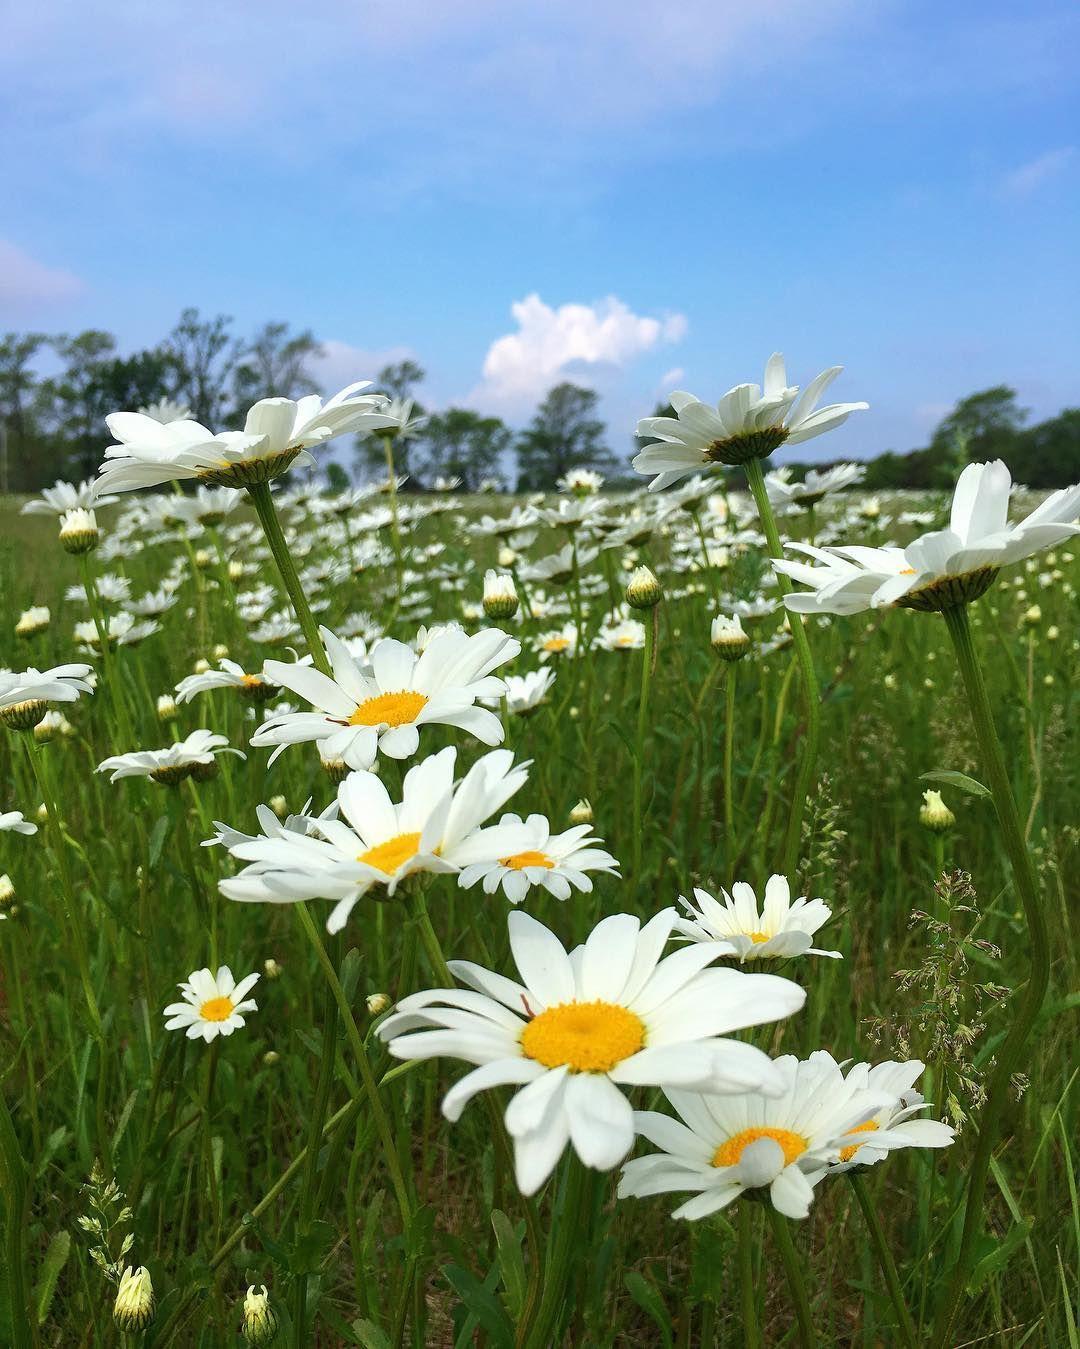 I'm on the pursuit of happiness  #exploremn #minnesota #onlyinmn #summertime by alikafaythe